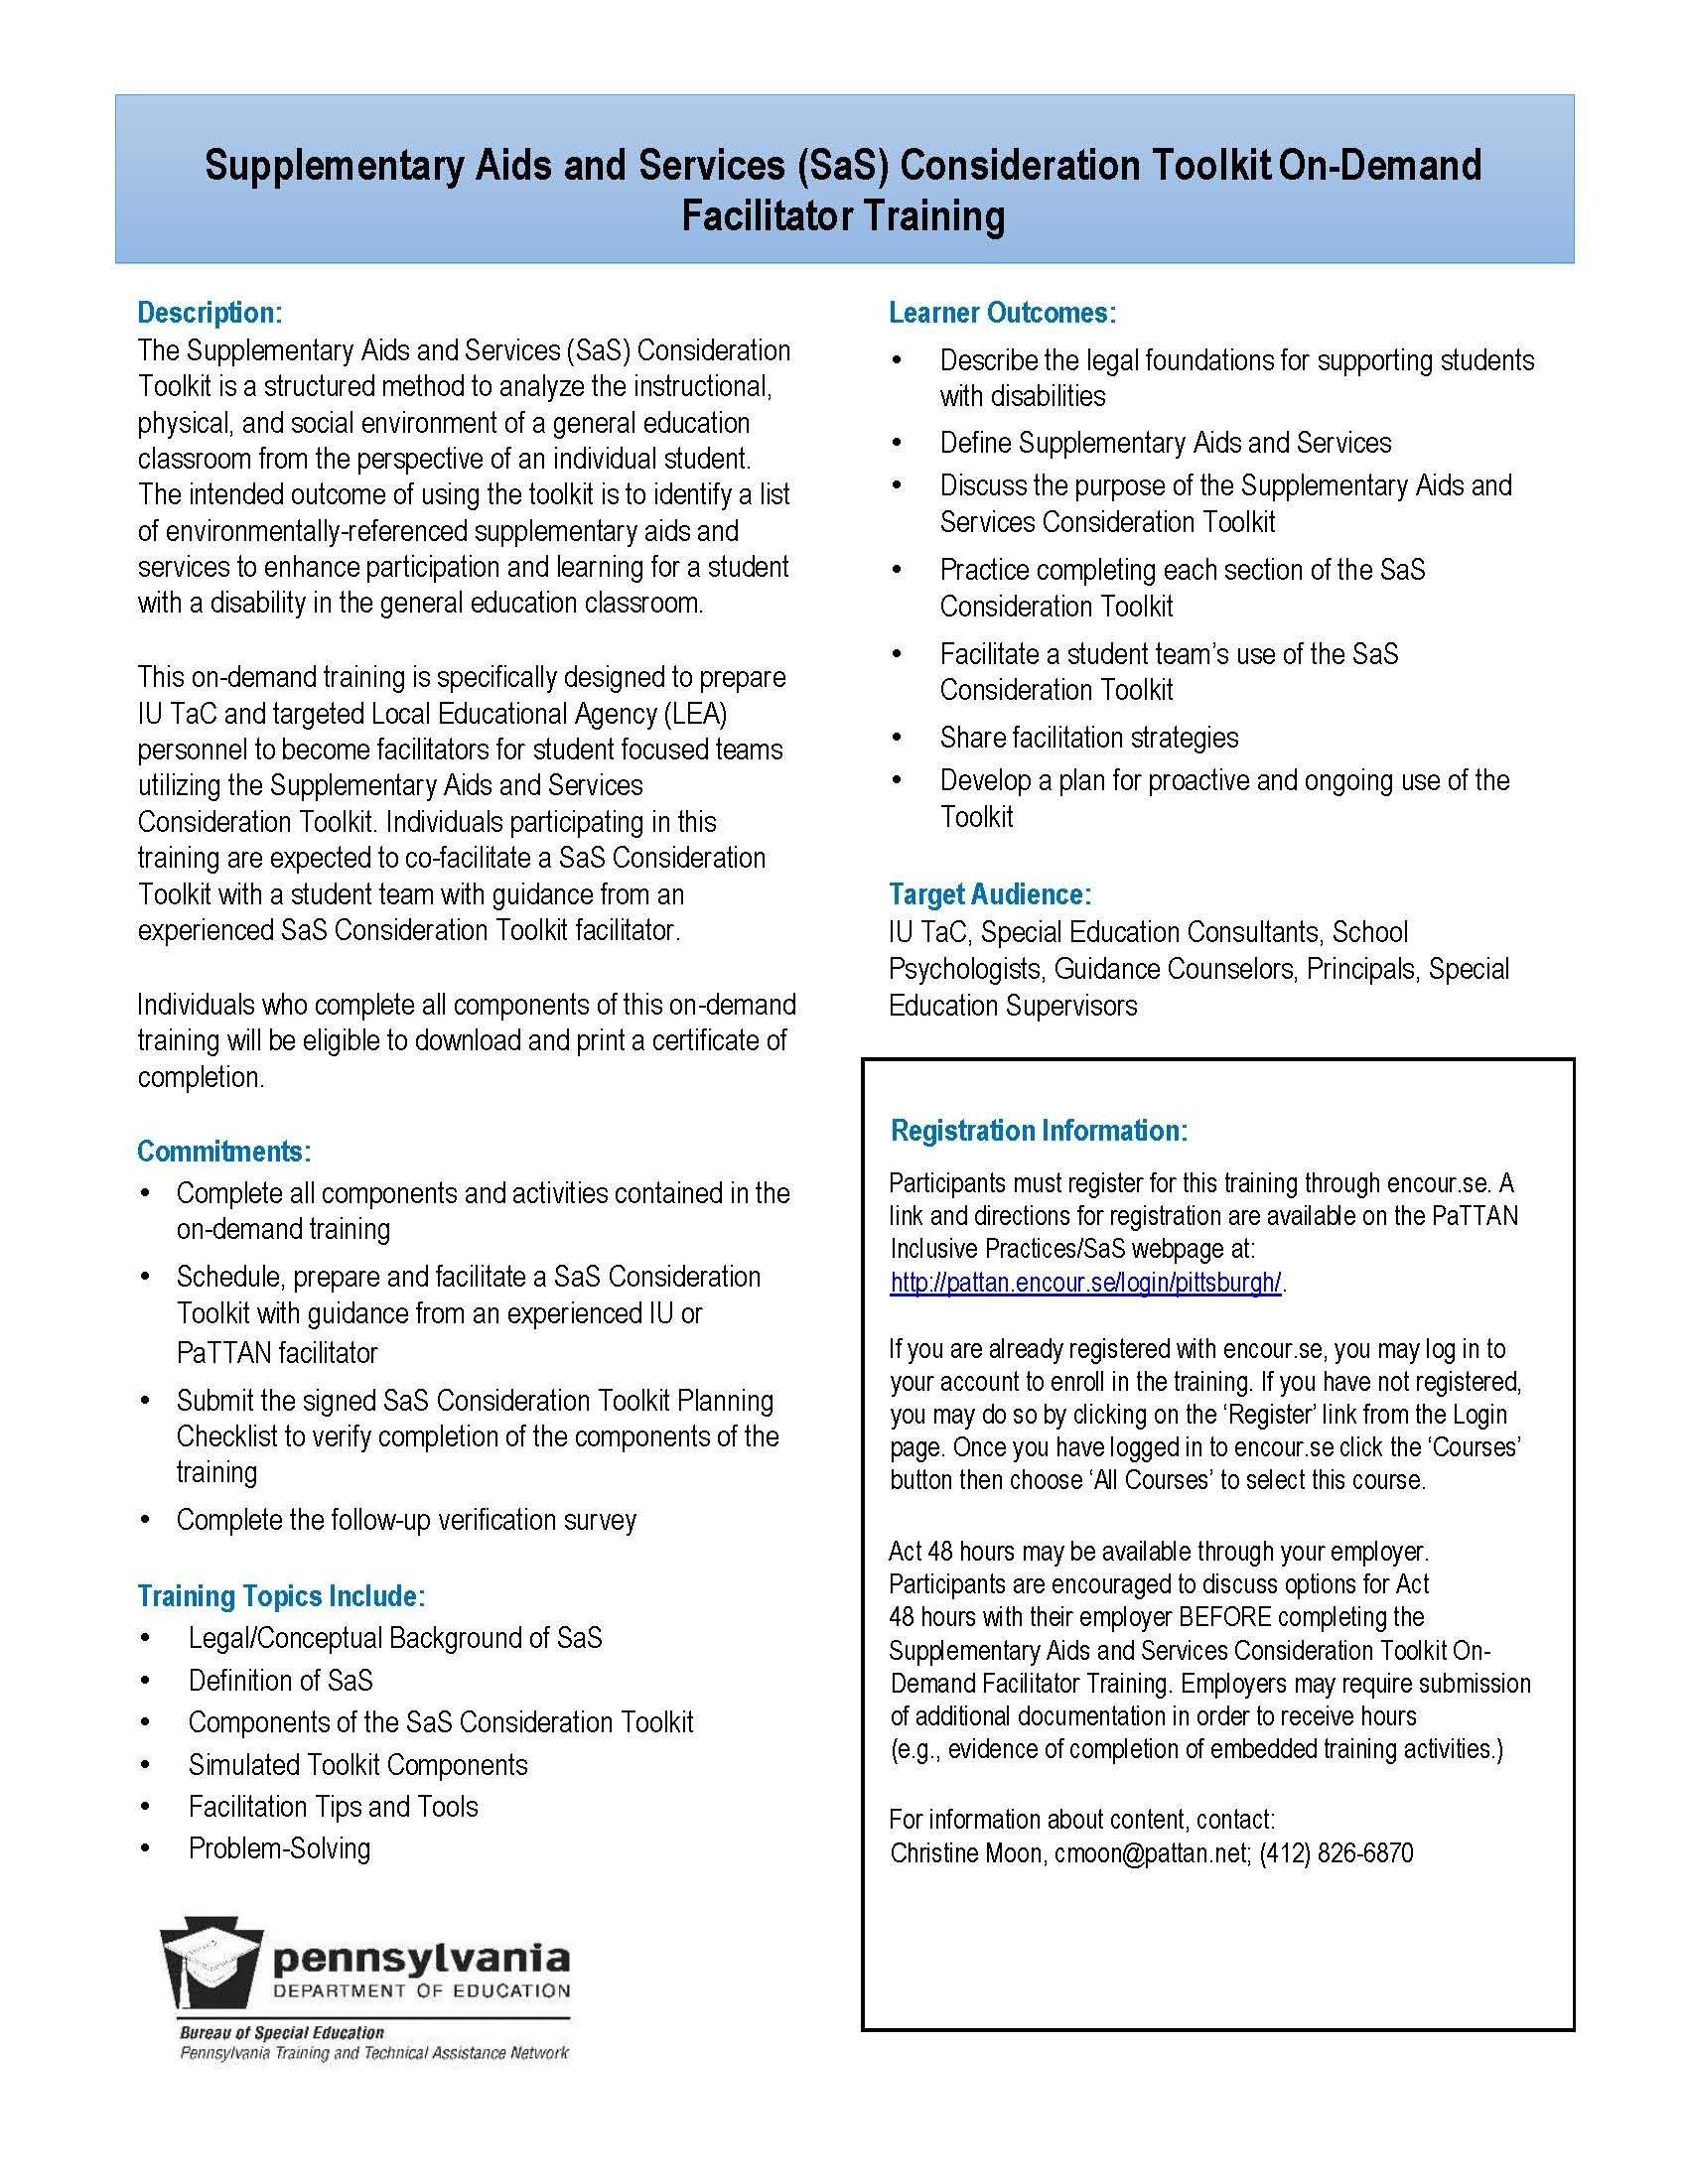 Equitable Distribution Worksheet Pa  Briefencounters Regarding Equitable Distribution Worksheet Pa